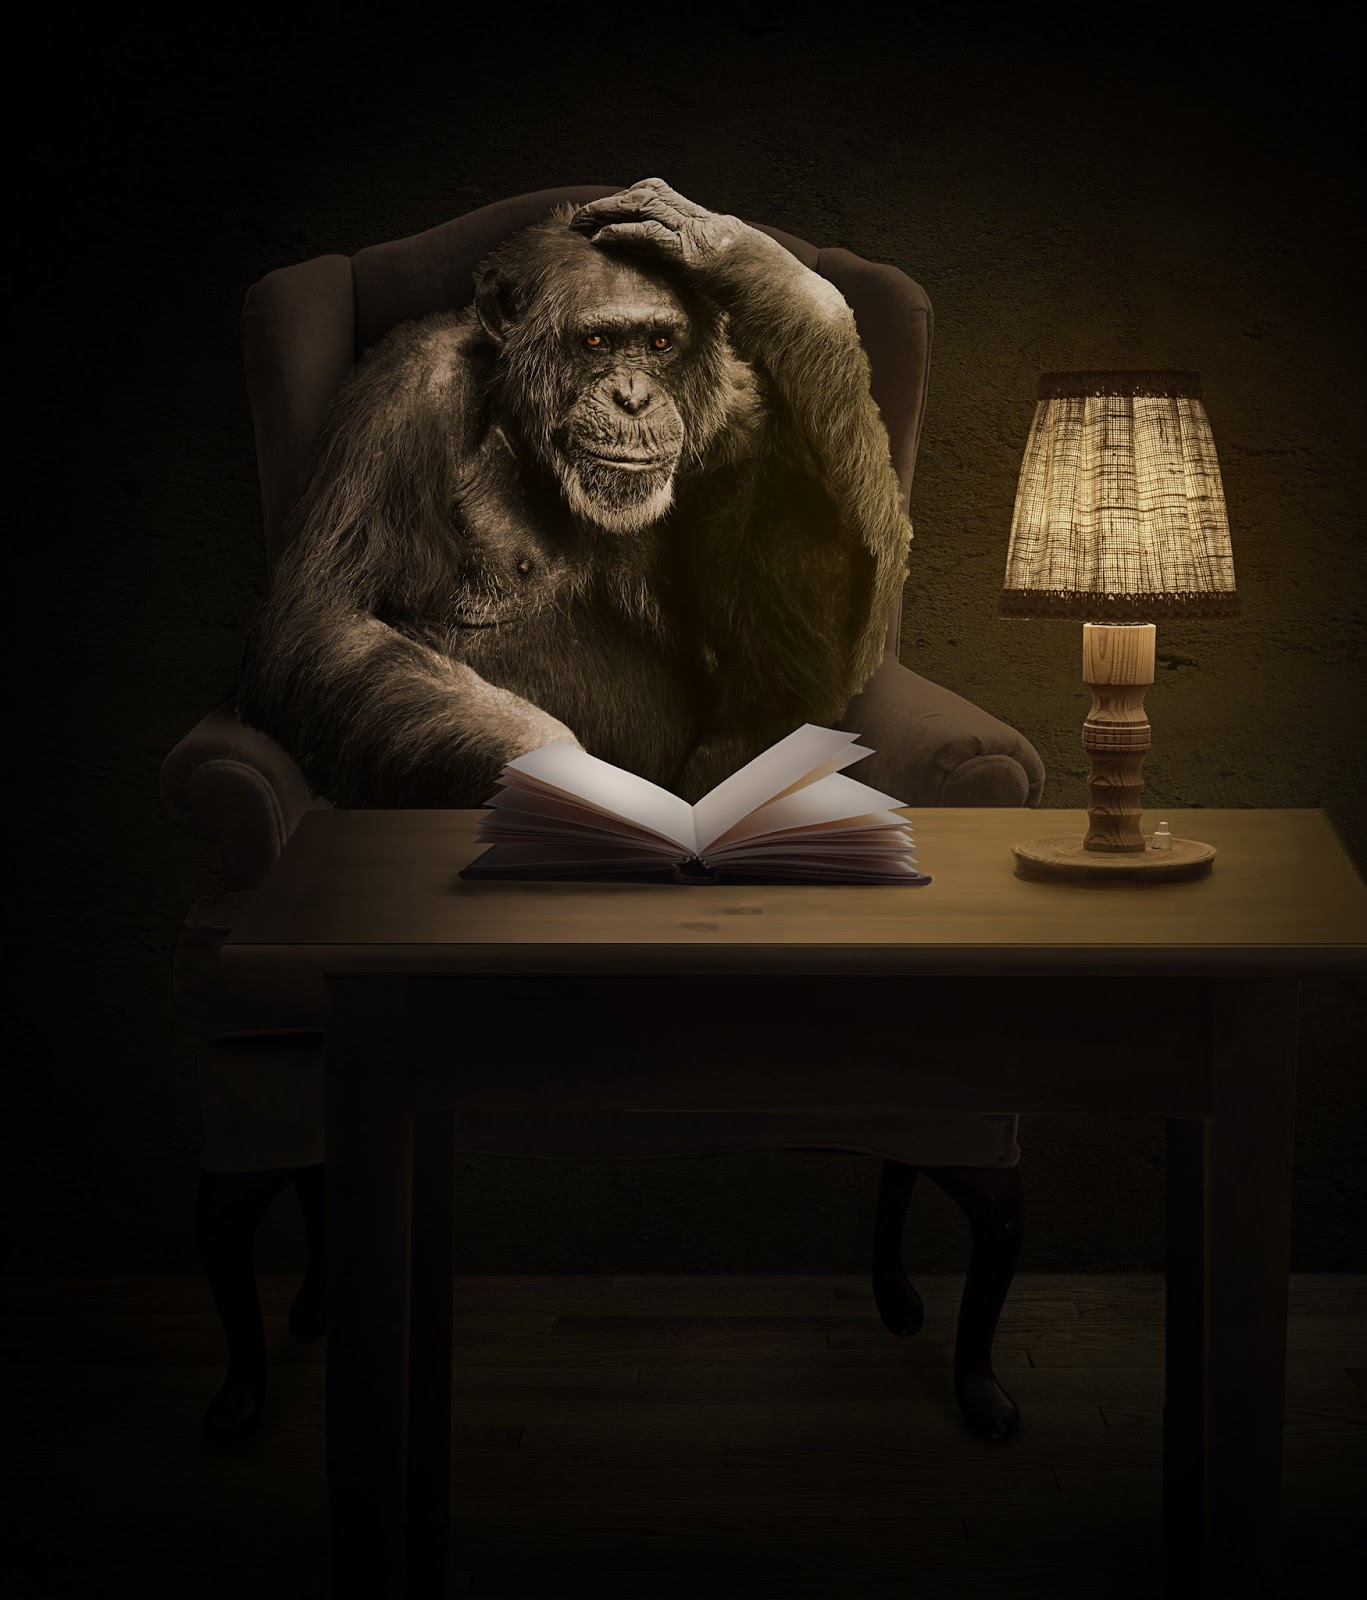 A chimpanzee reading a book.